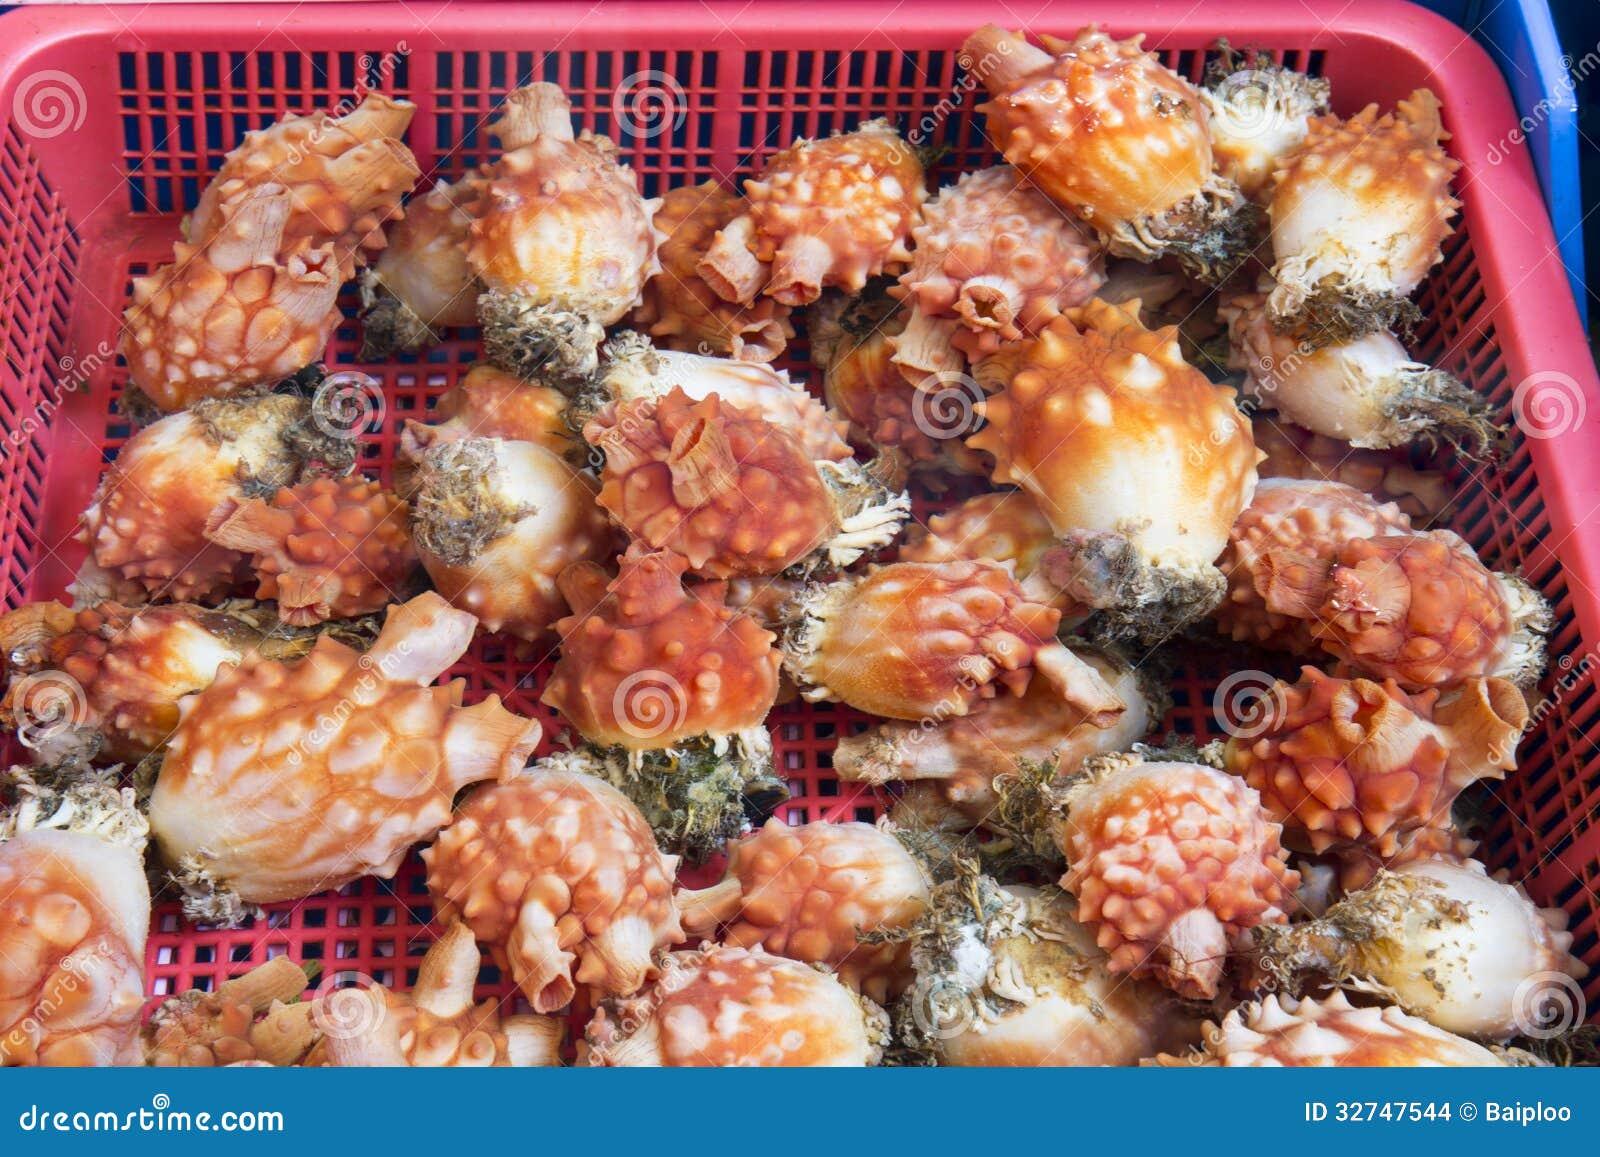 sea squirt for sale Munchkin Squirtin' Sea Buddies Bath Toy - 5  - Best Buy Canada.